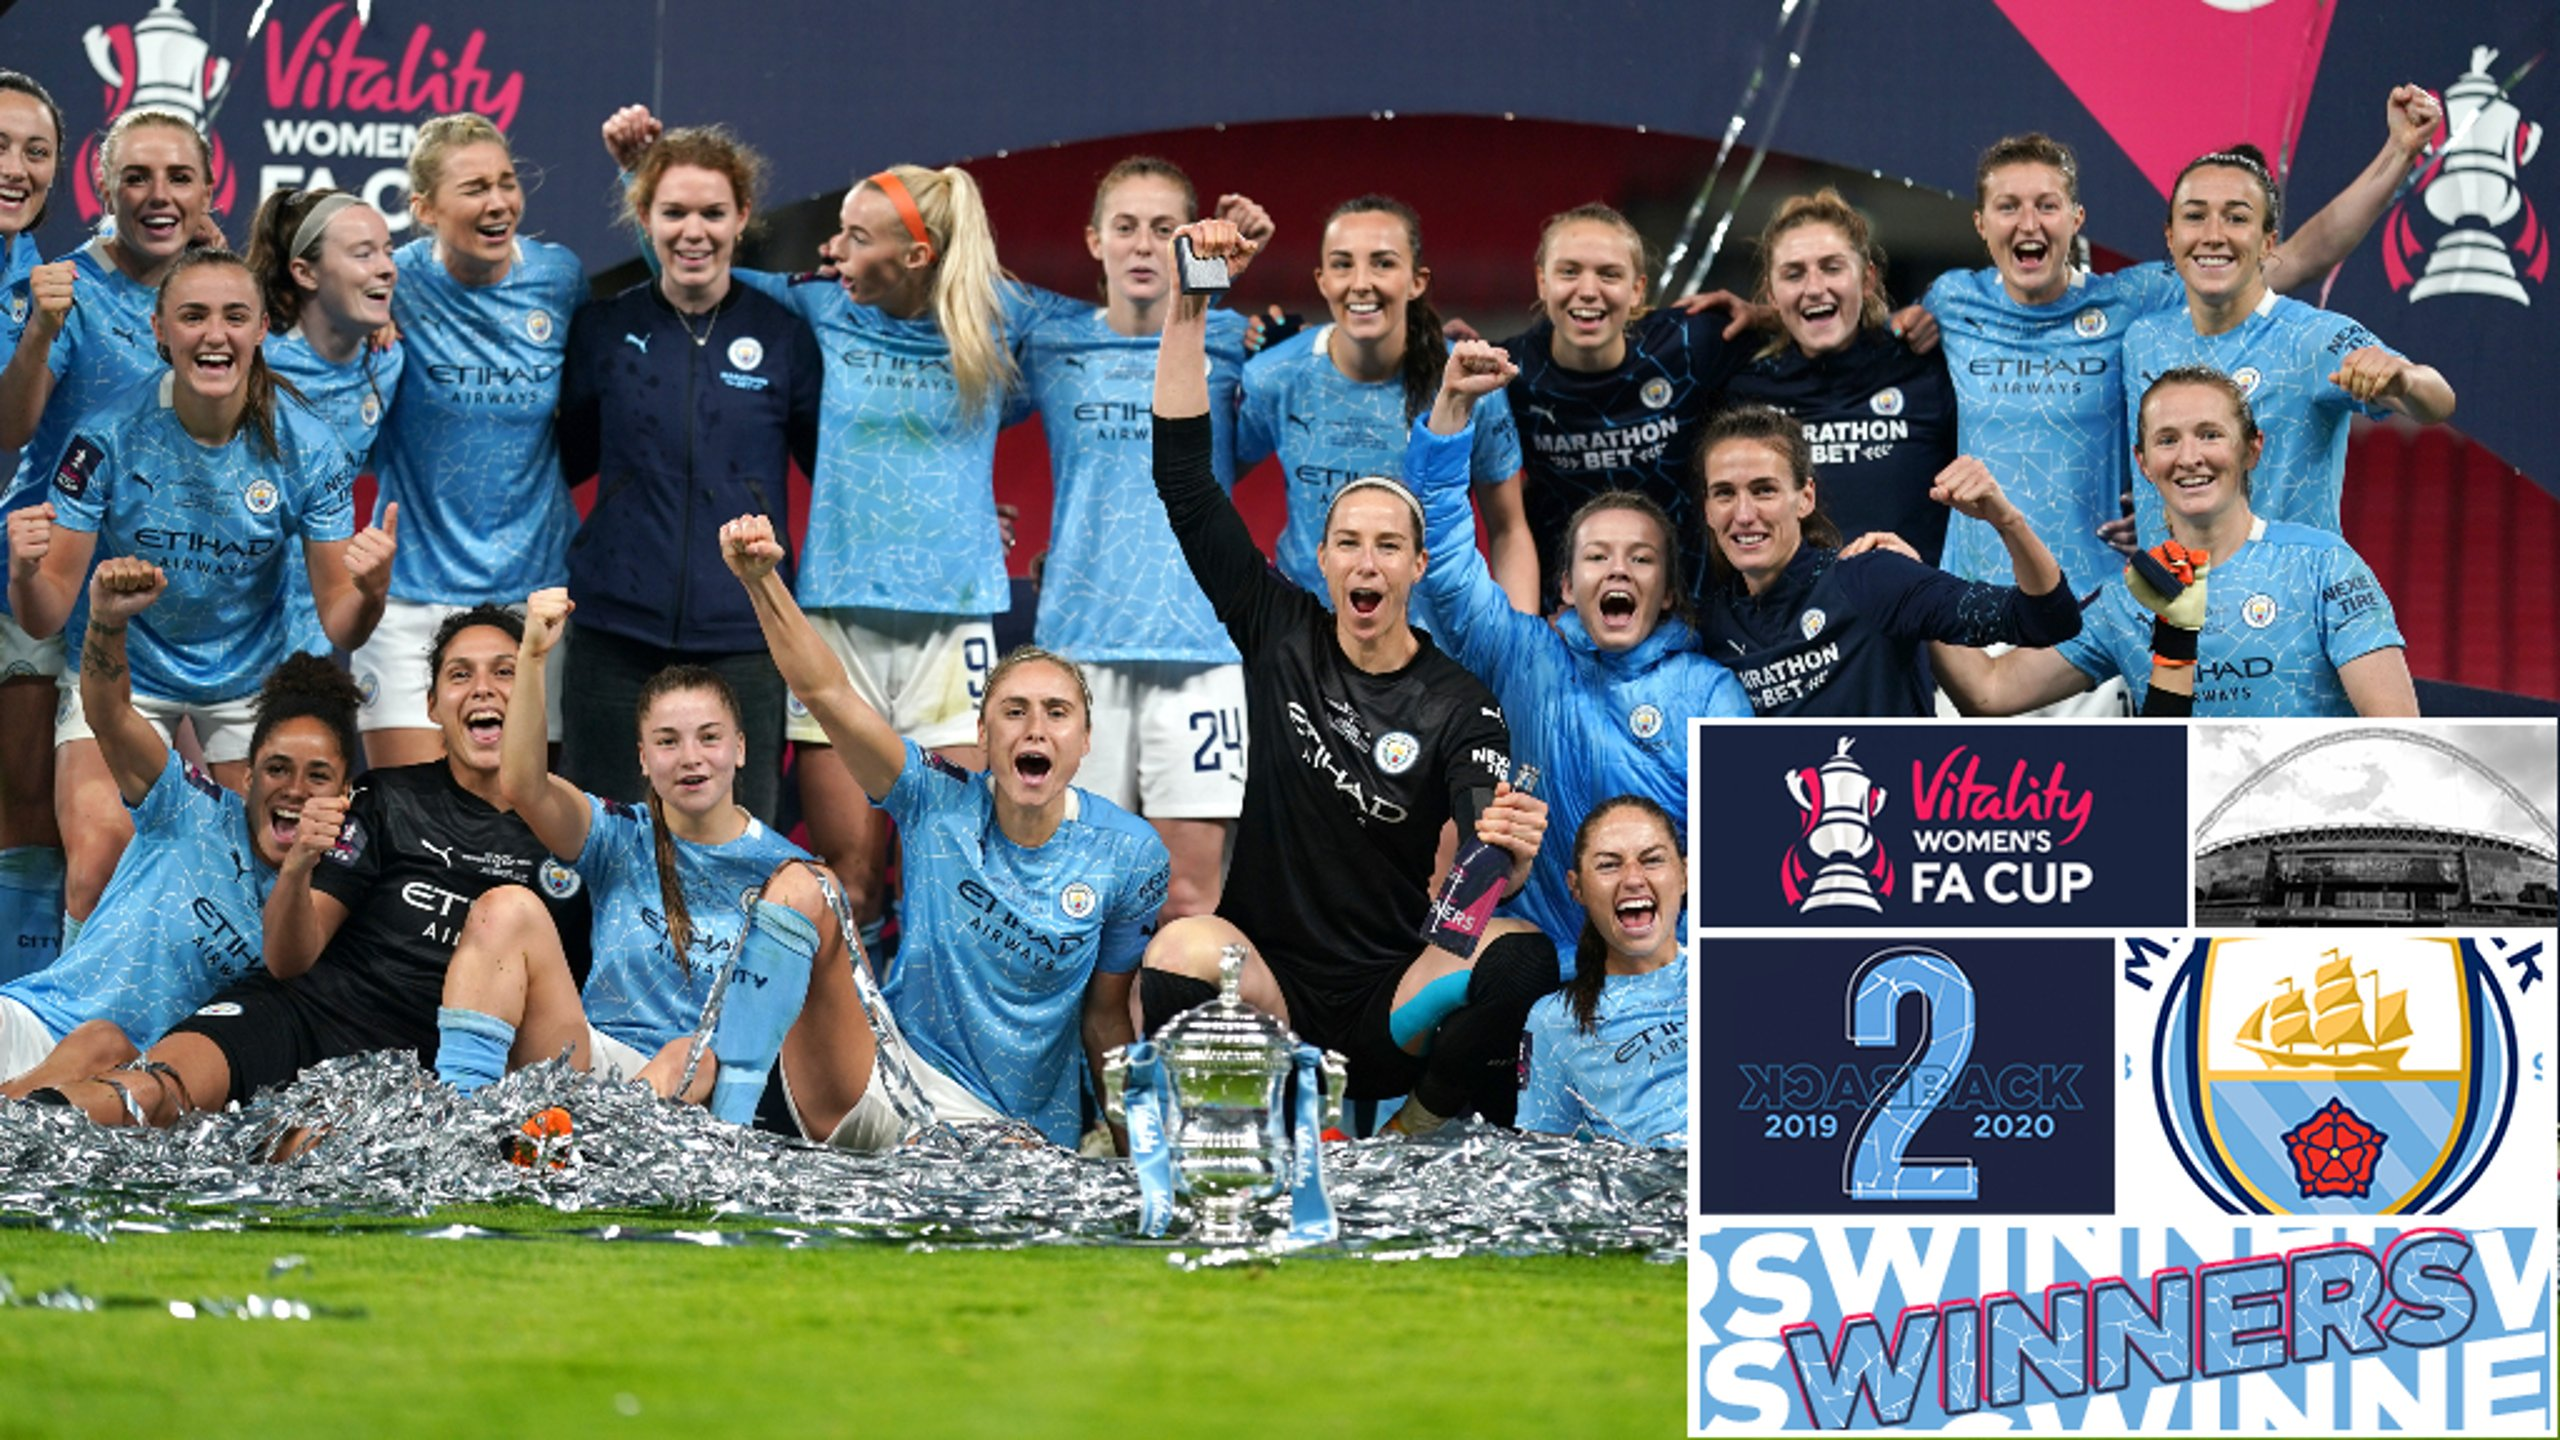 Back-2-back: Women's FA Cup Champions 2020!